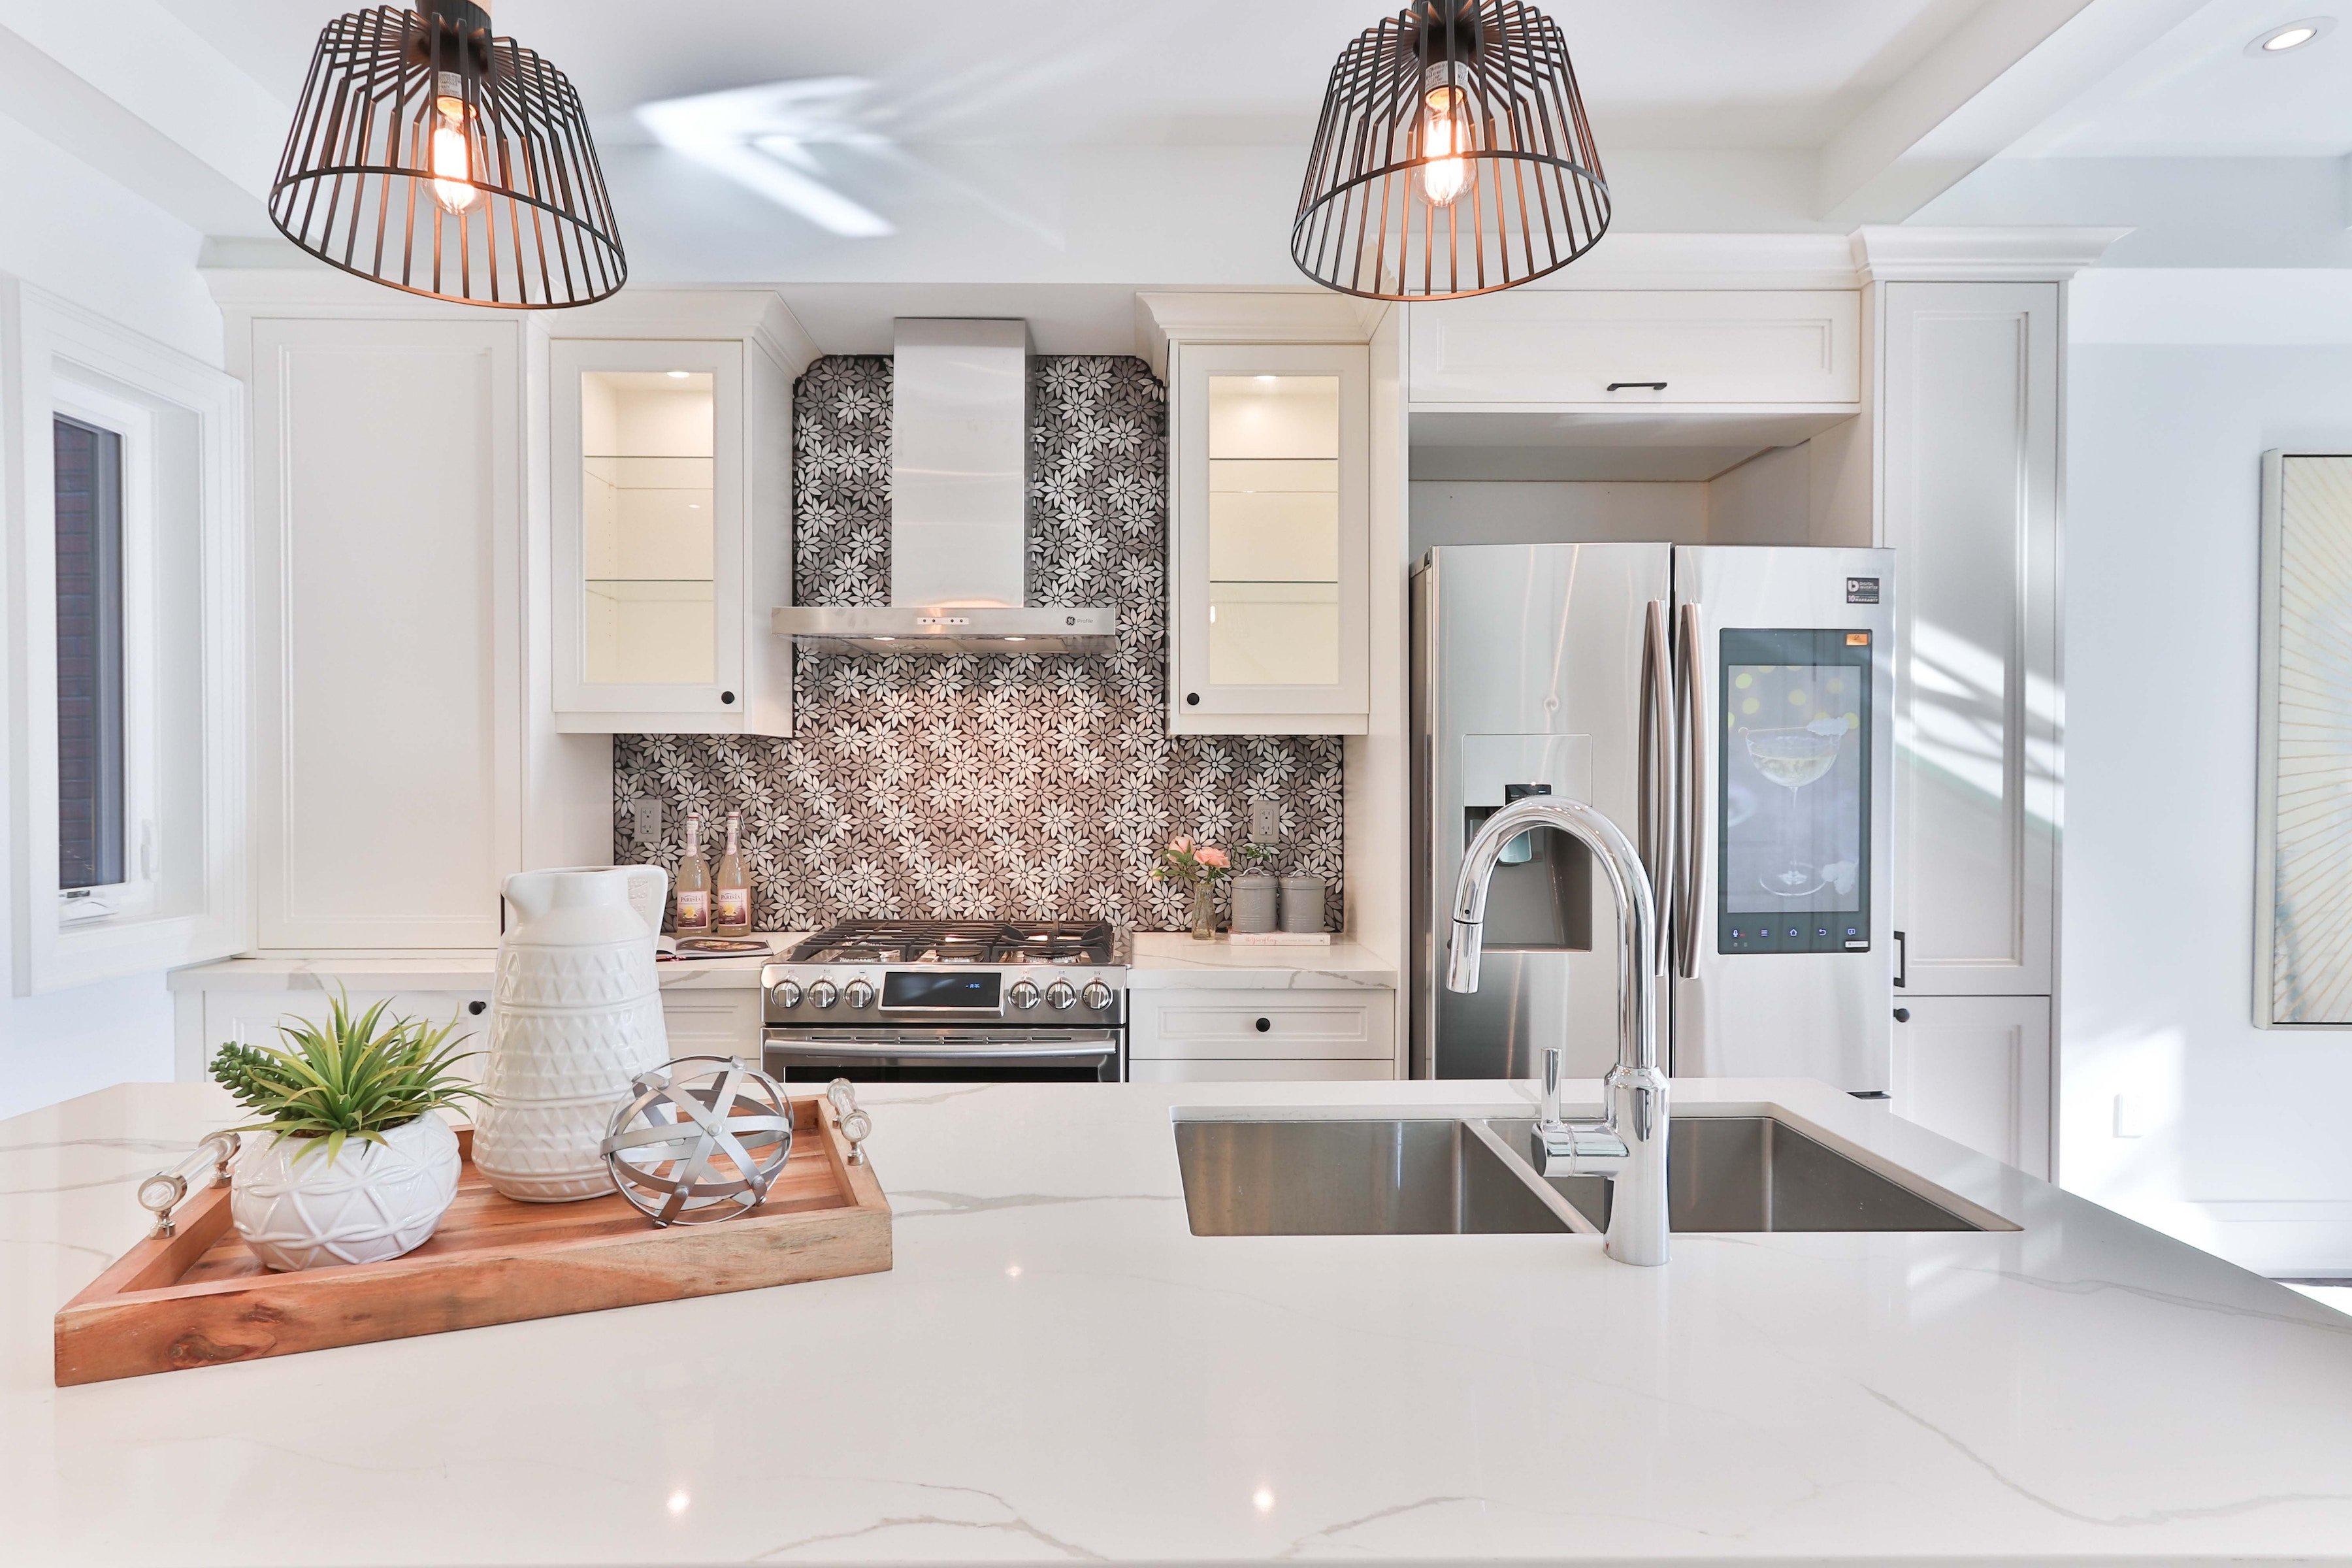 Another kitchen design trend is quartz countertops